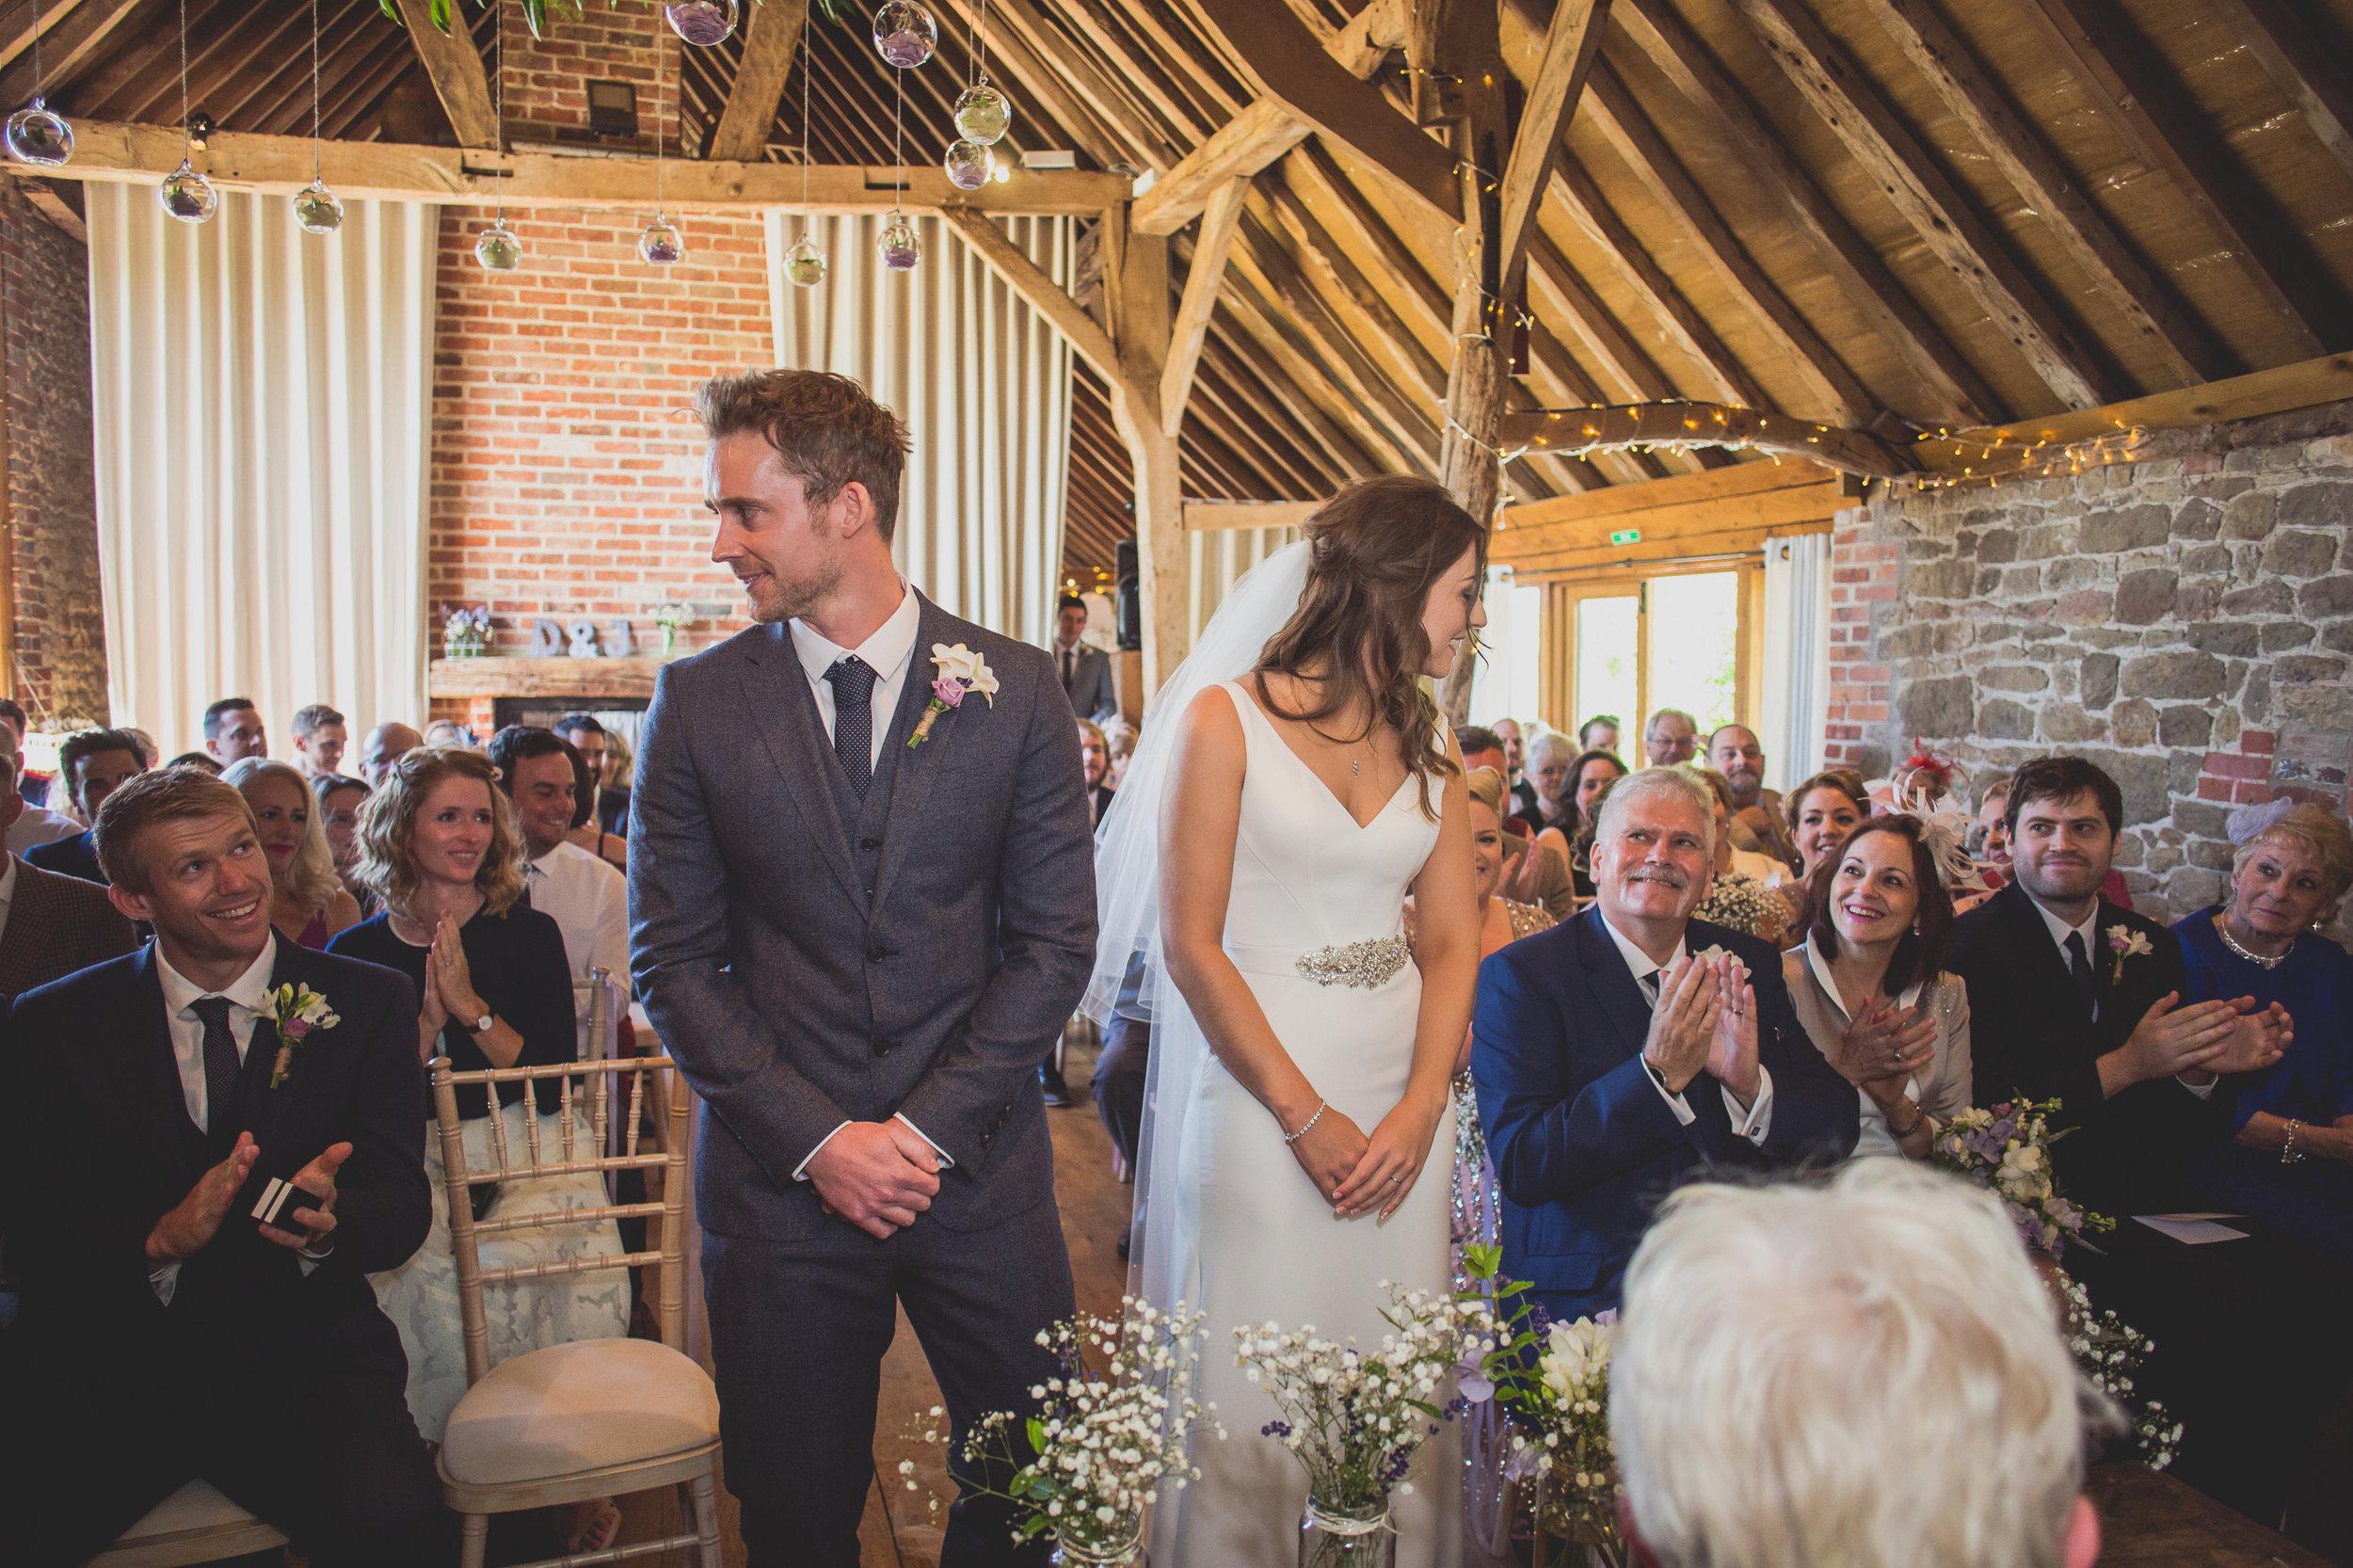 Grittenham Barn female wedding photographers west sussex petworth social-63.jpg